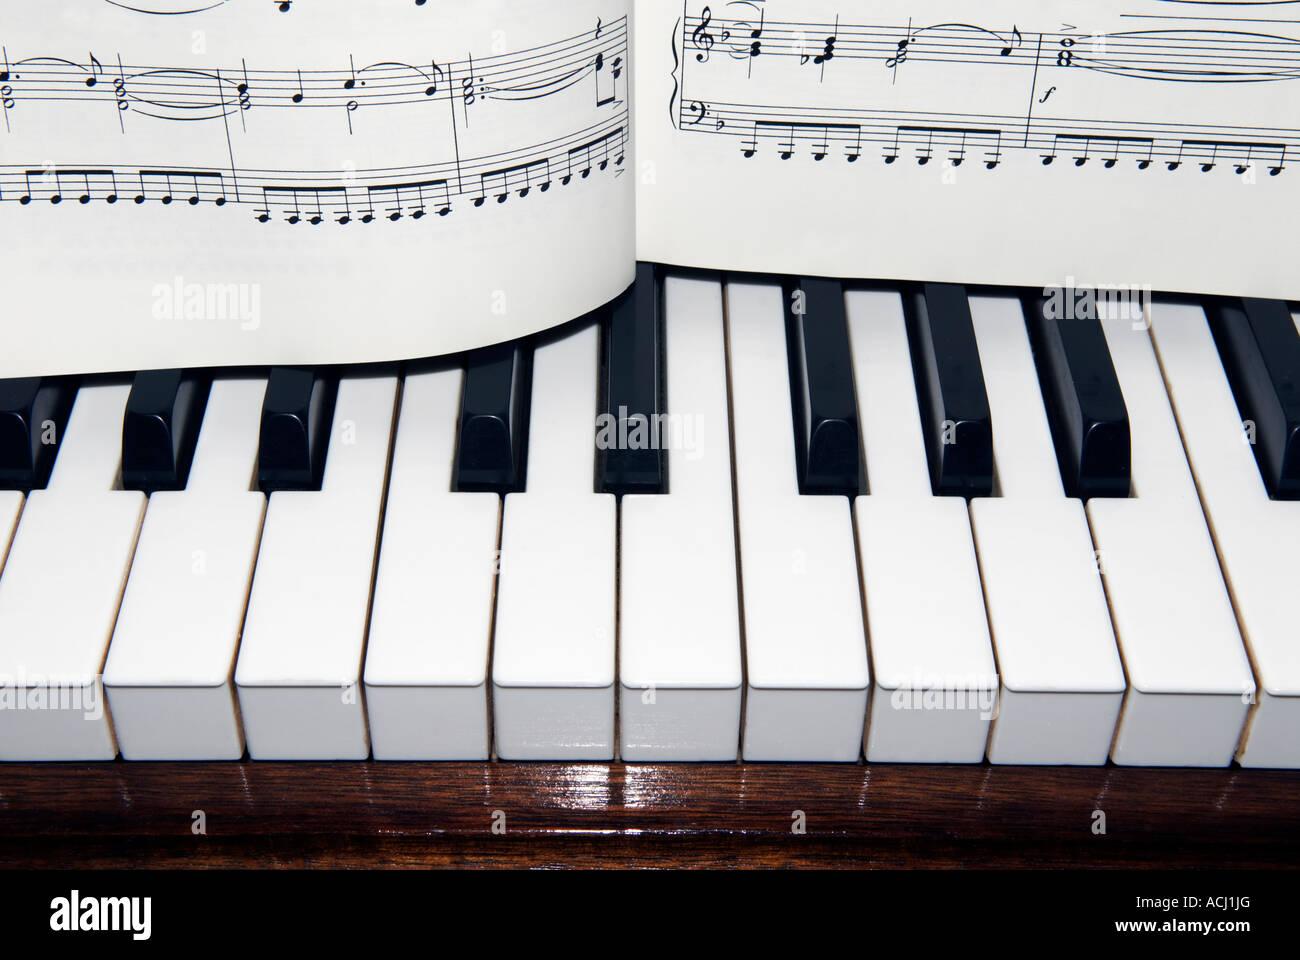 Piano Keyboard Keys And Sheet Music Spread Across The Keys Stock